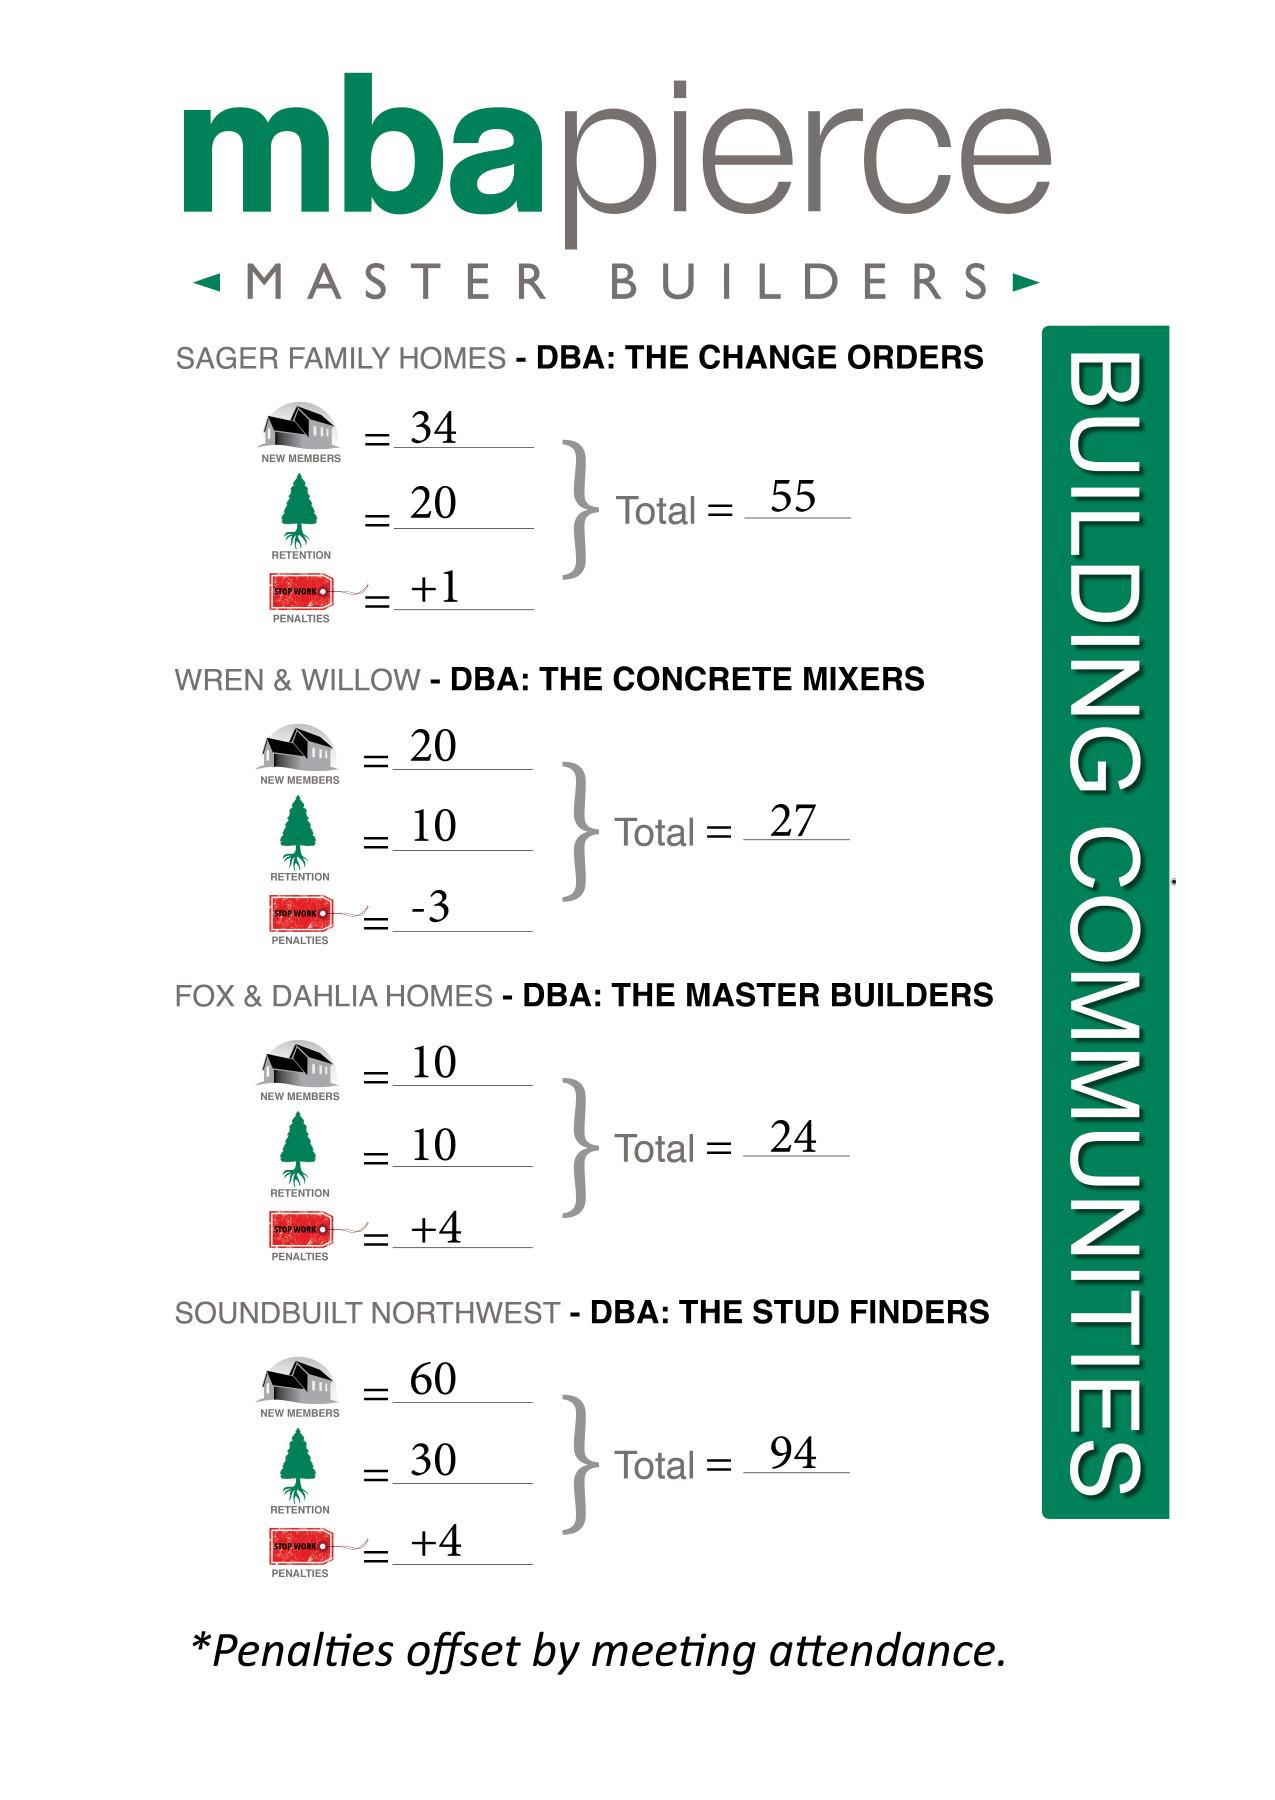 Building-CommunitiesContest3.06.17WEB-w1275.jpg